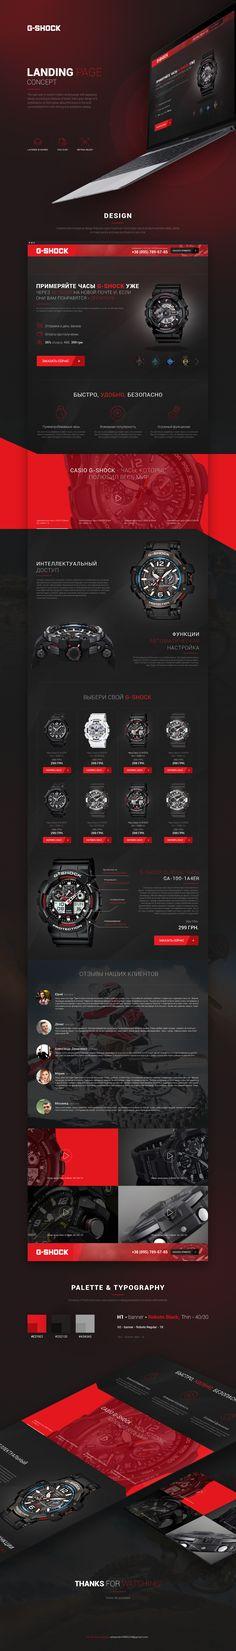 Landing Page для продажи часов G-Shock on Behance